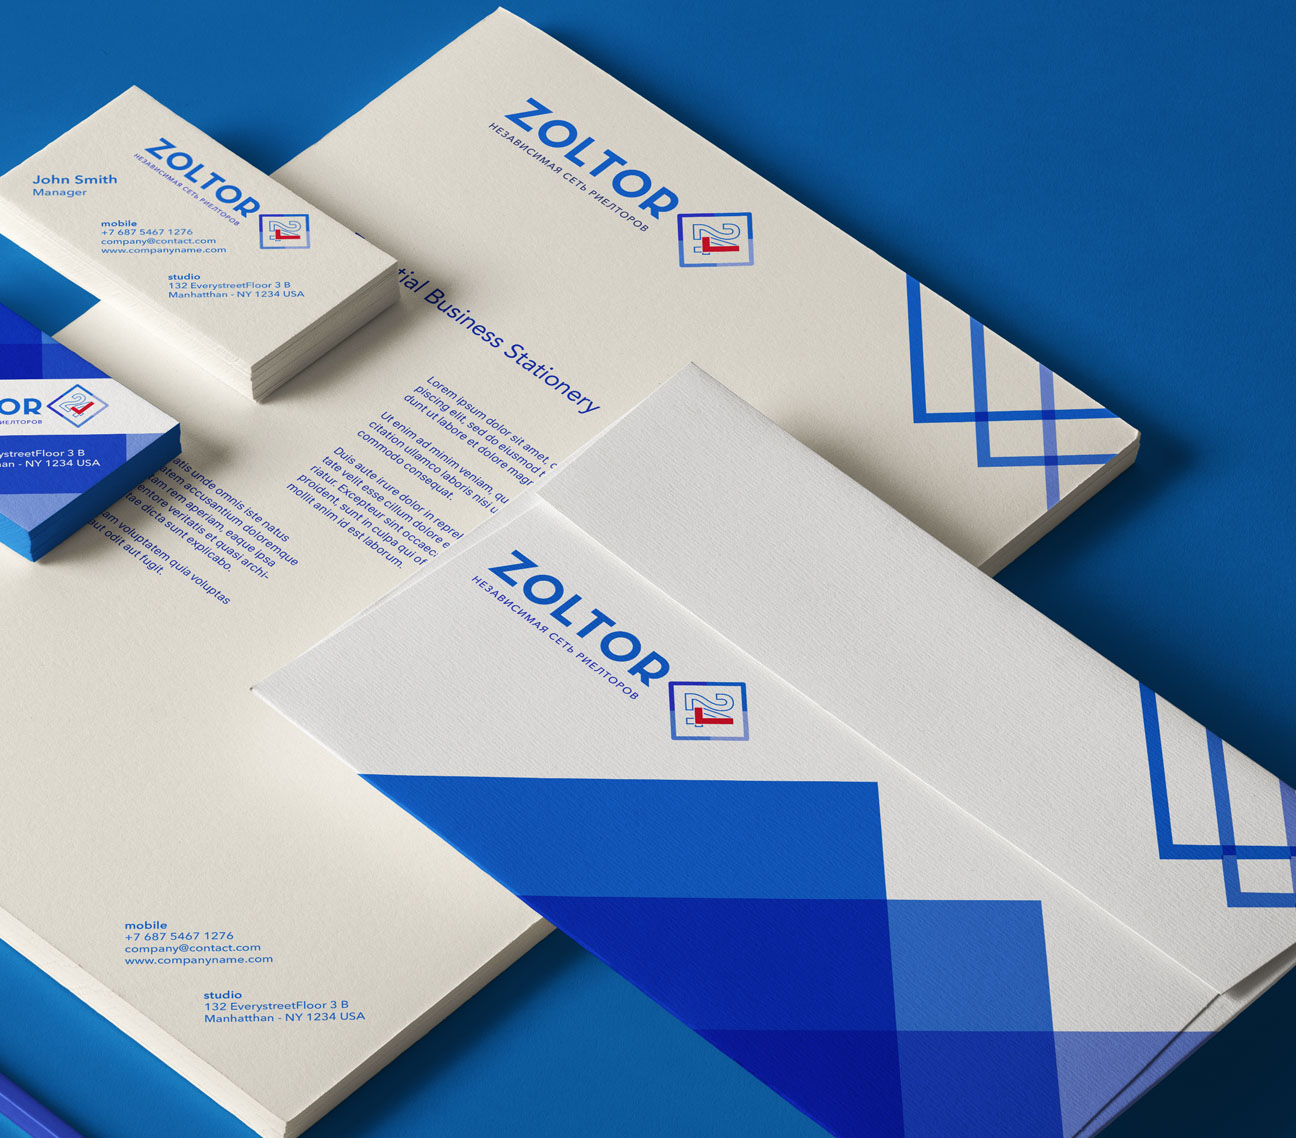 Логотип и фирменный стиль ZolTor24 фото f_4335c9134e209b5c.jpg